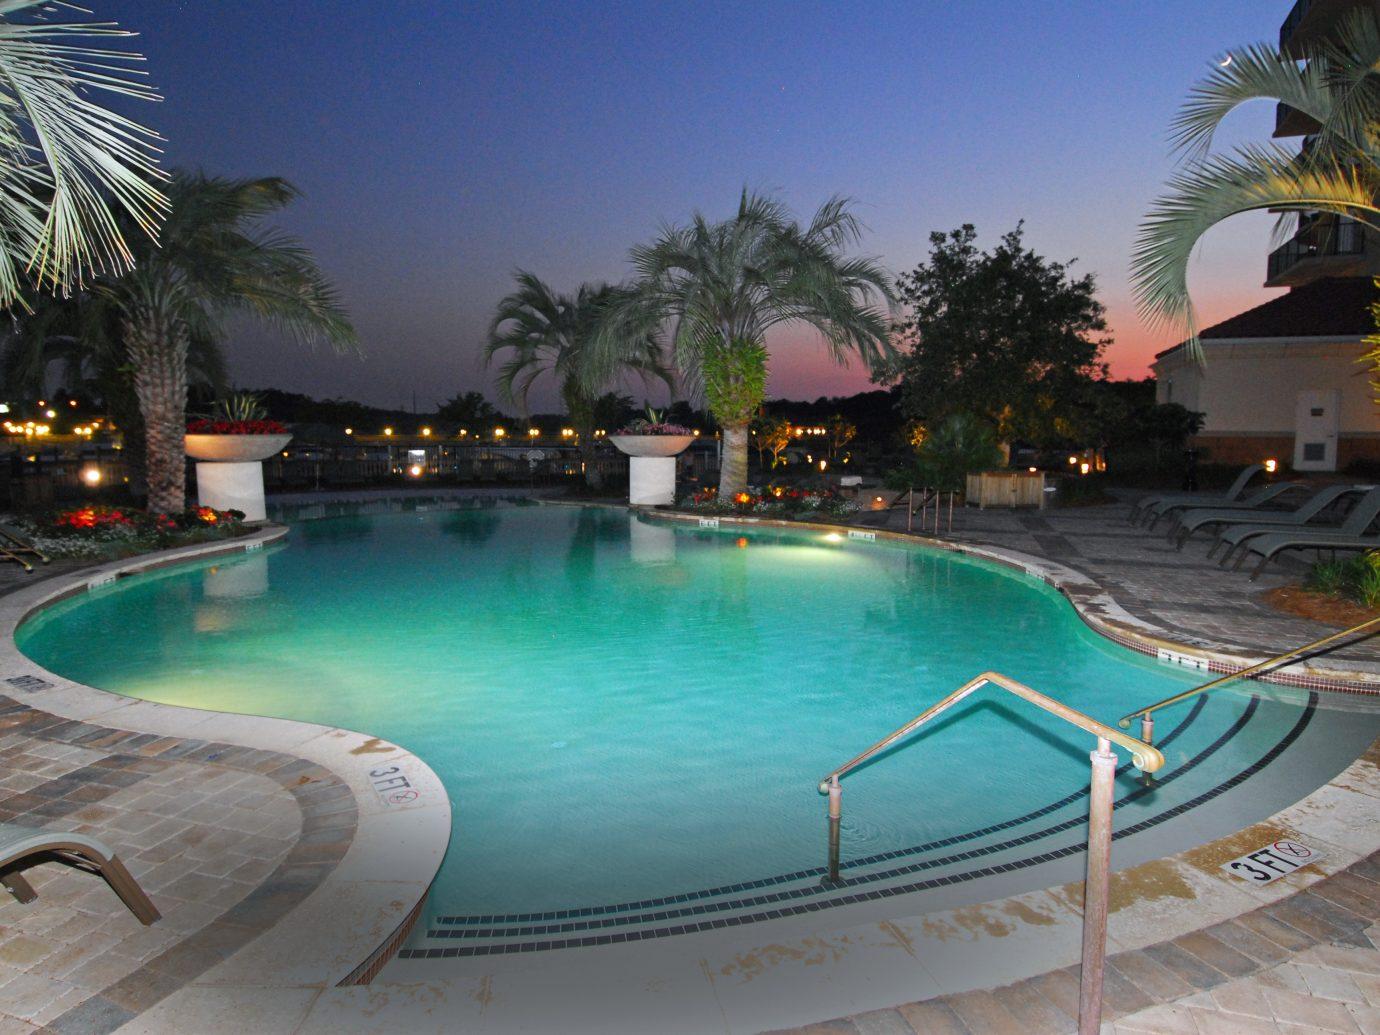 Inn Lounge Patio Pool Resort Trip Ideas outdoor water swimming pool property leisure estate vacation Villa resort town condominium backyard reflecting pool mansion lined several